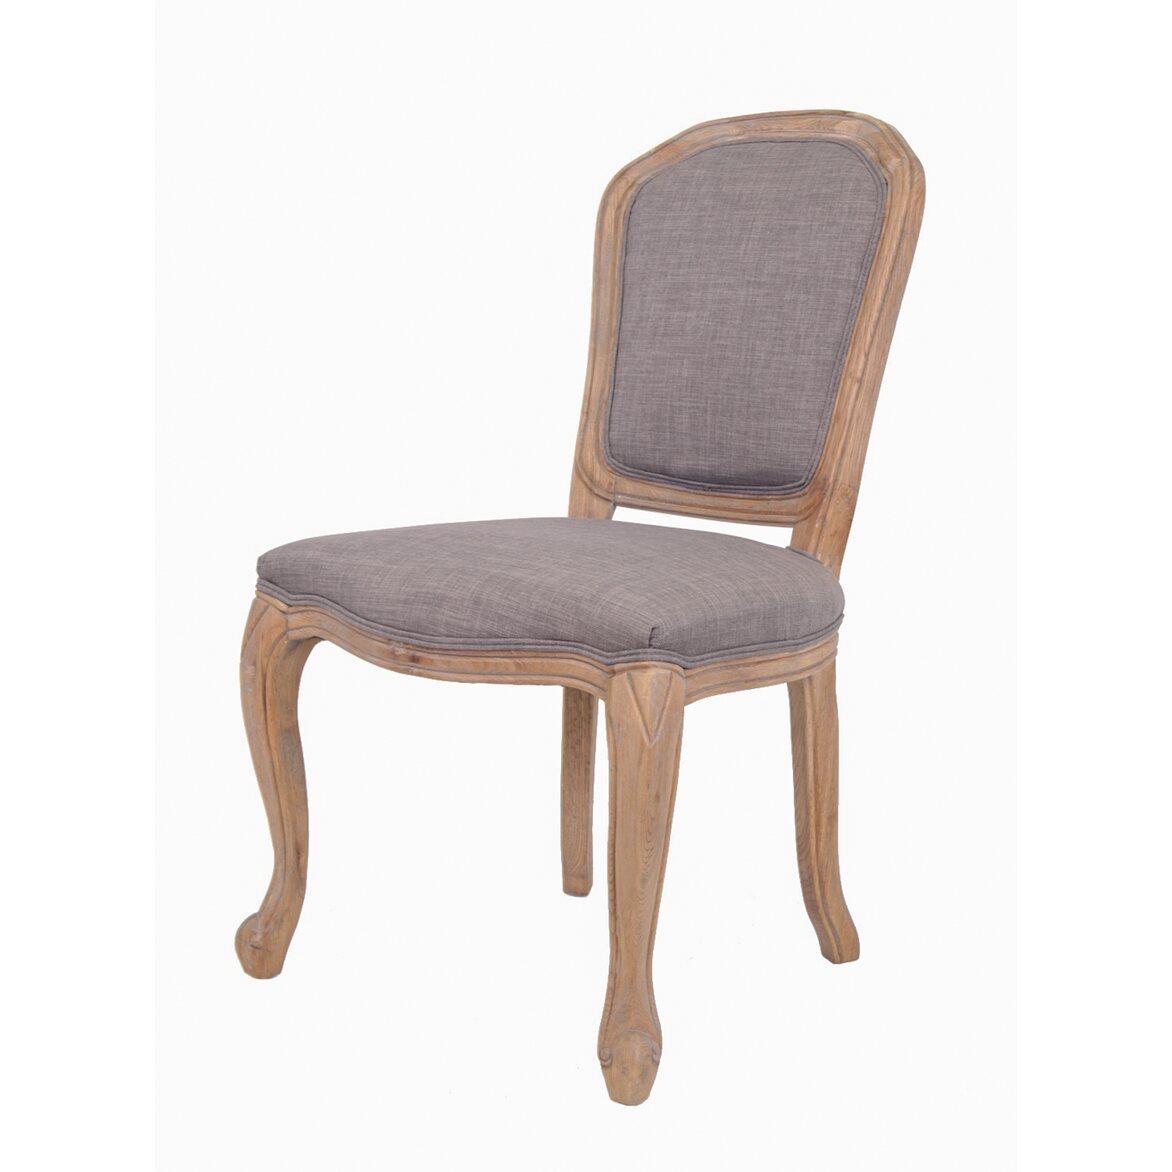 Стул Granes grey 4 | Обеденные стулья Kingsby